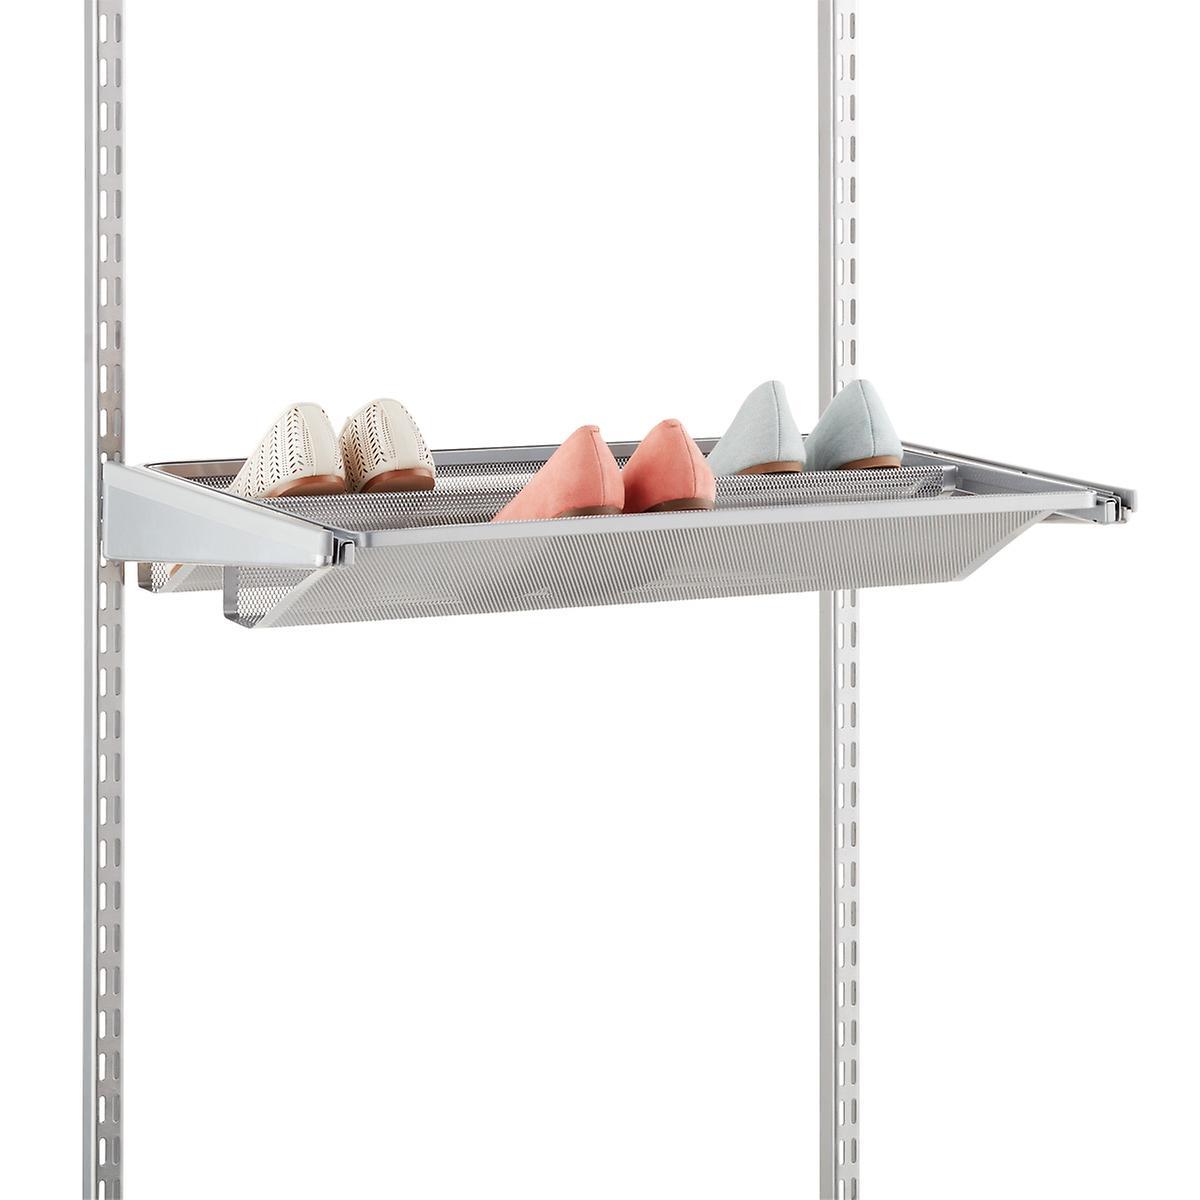 Platinum Elfa Gliding Mesh Shoe Shelves